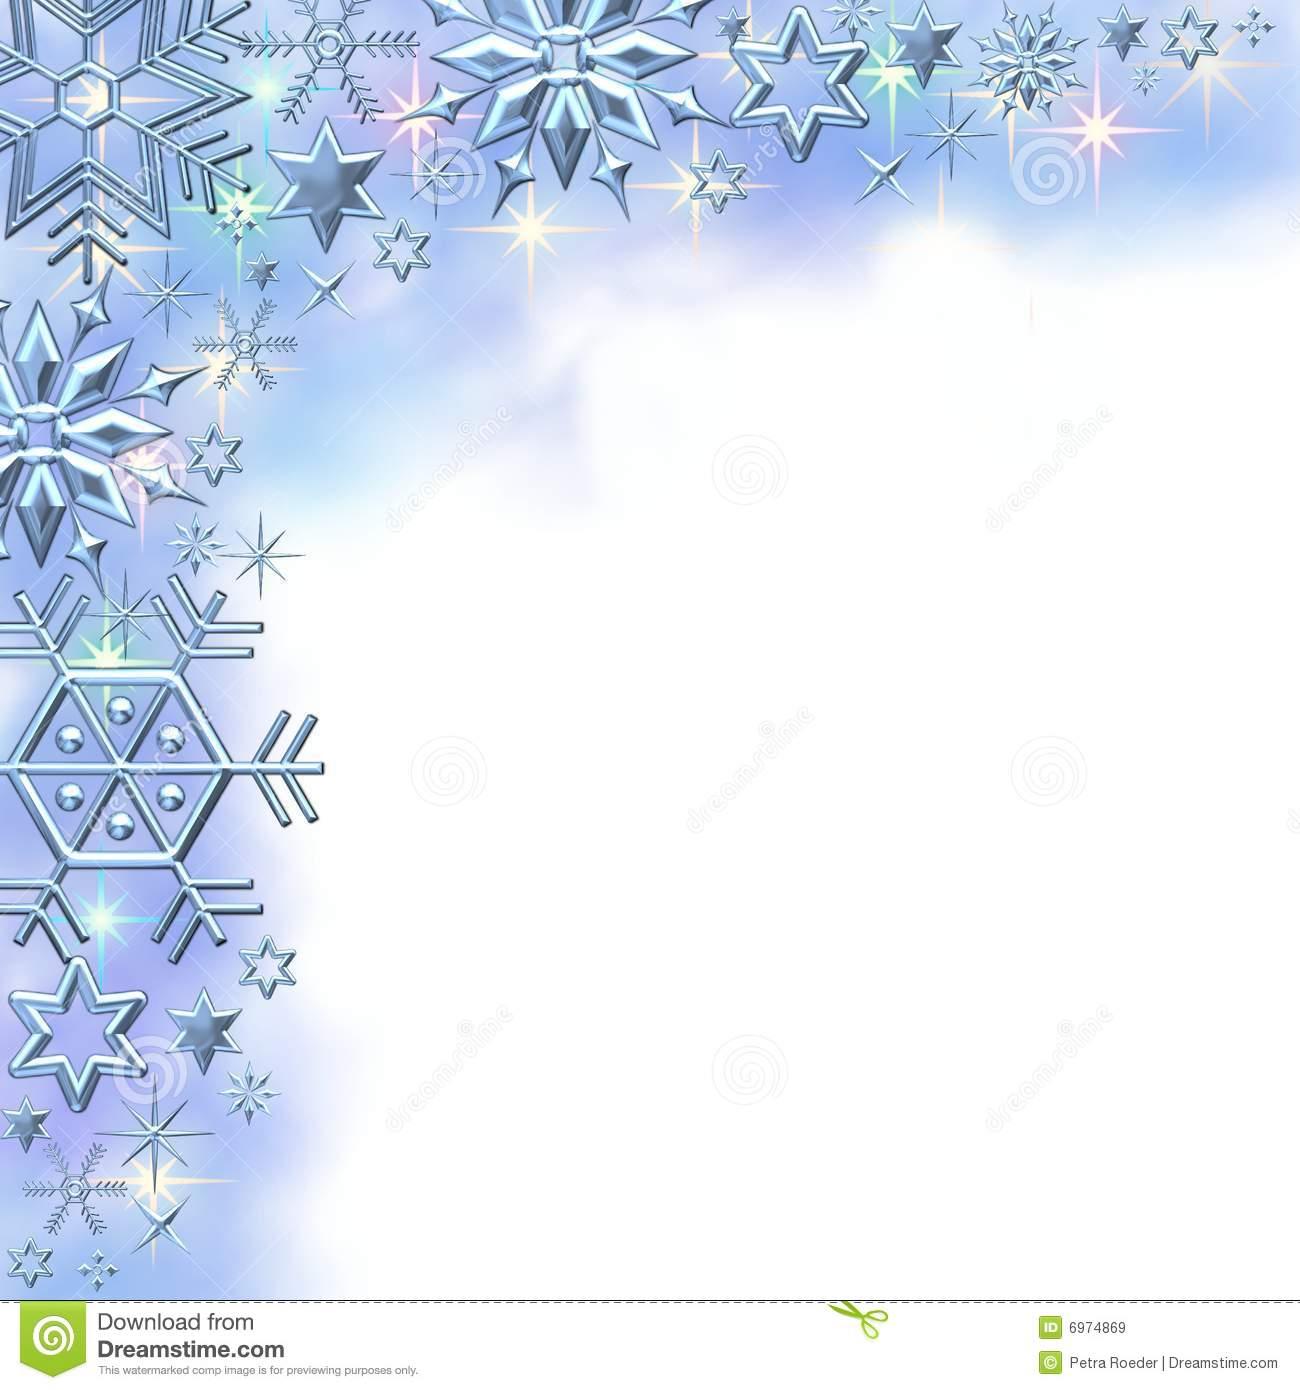 Snowflake Border Clipart.